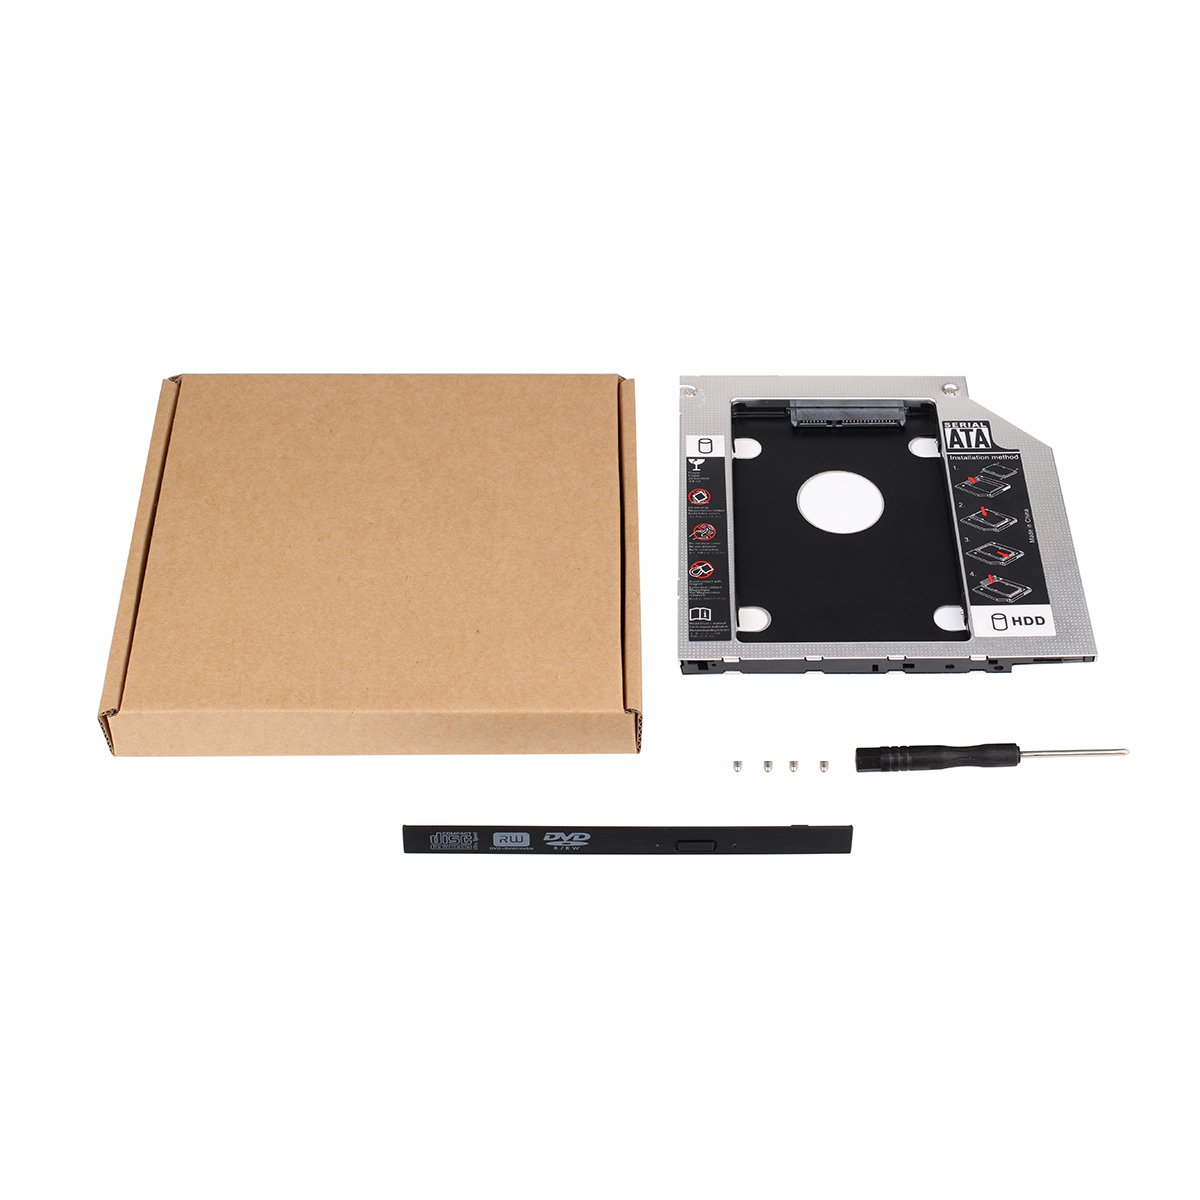 Bandeja para disco duro secundario SSD SATA de 63 mm; apta para ...